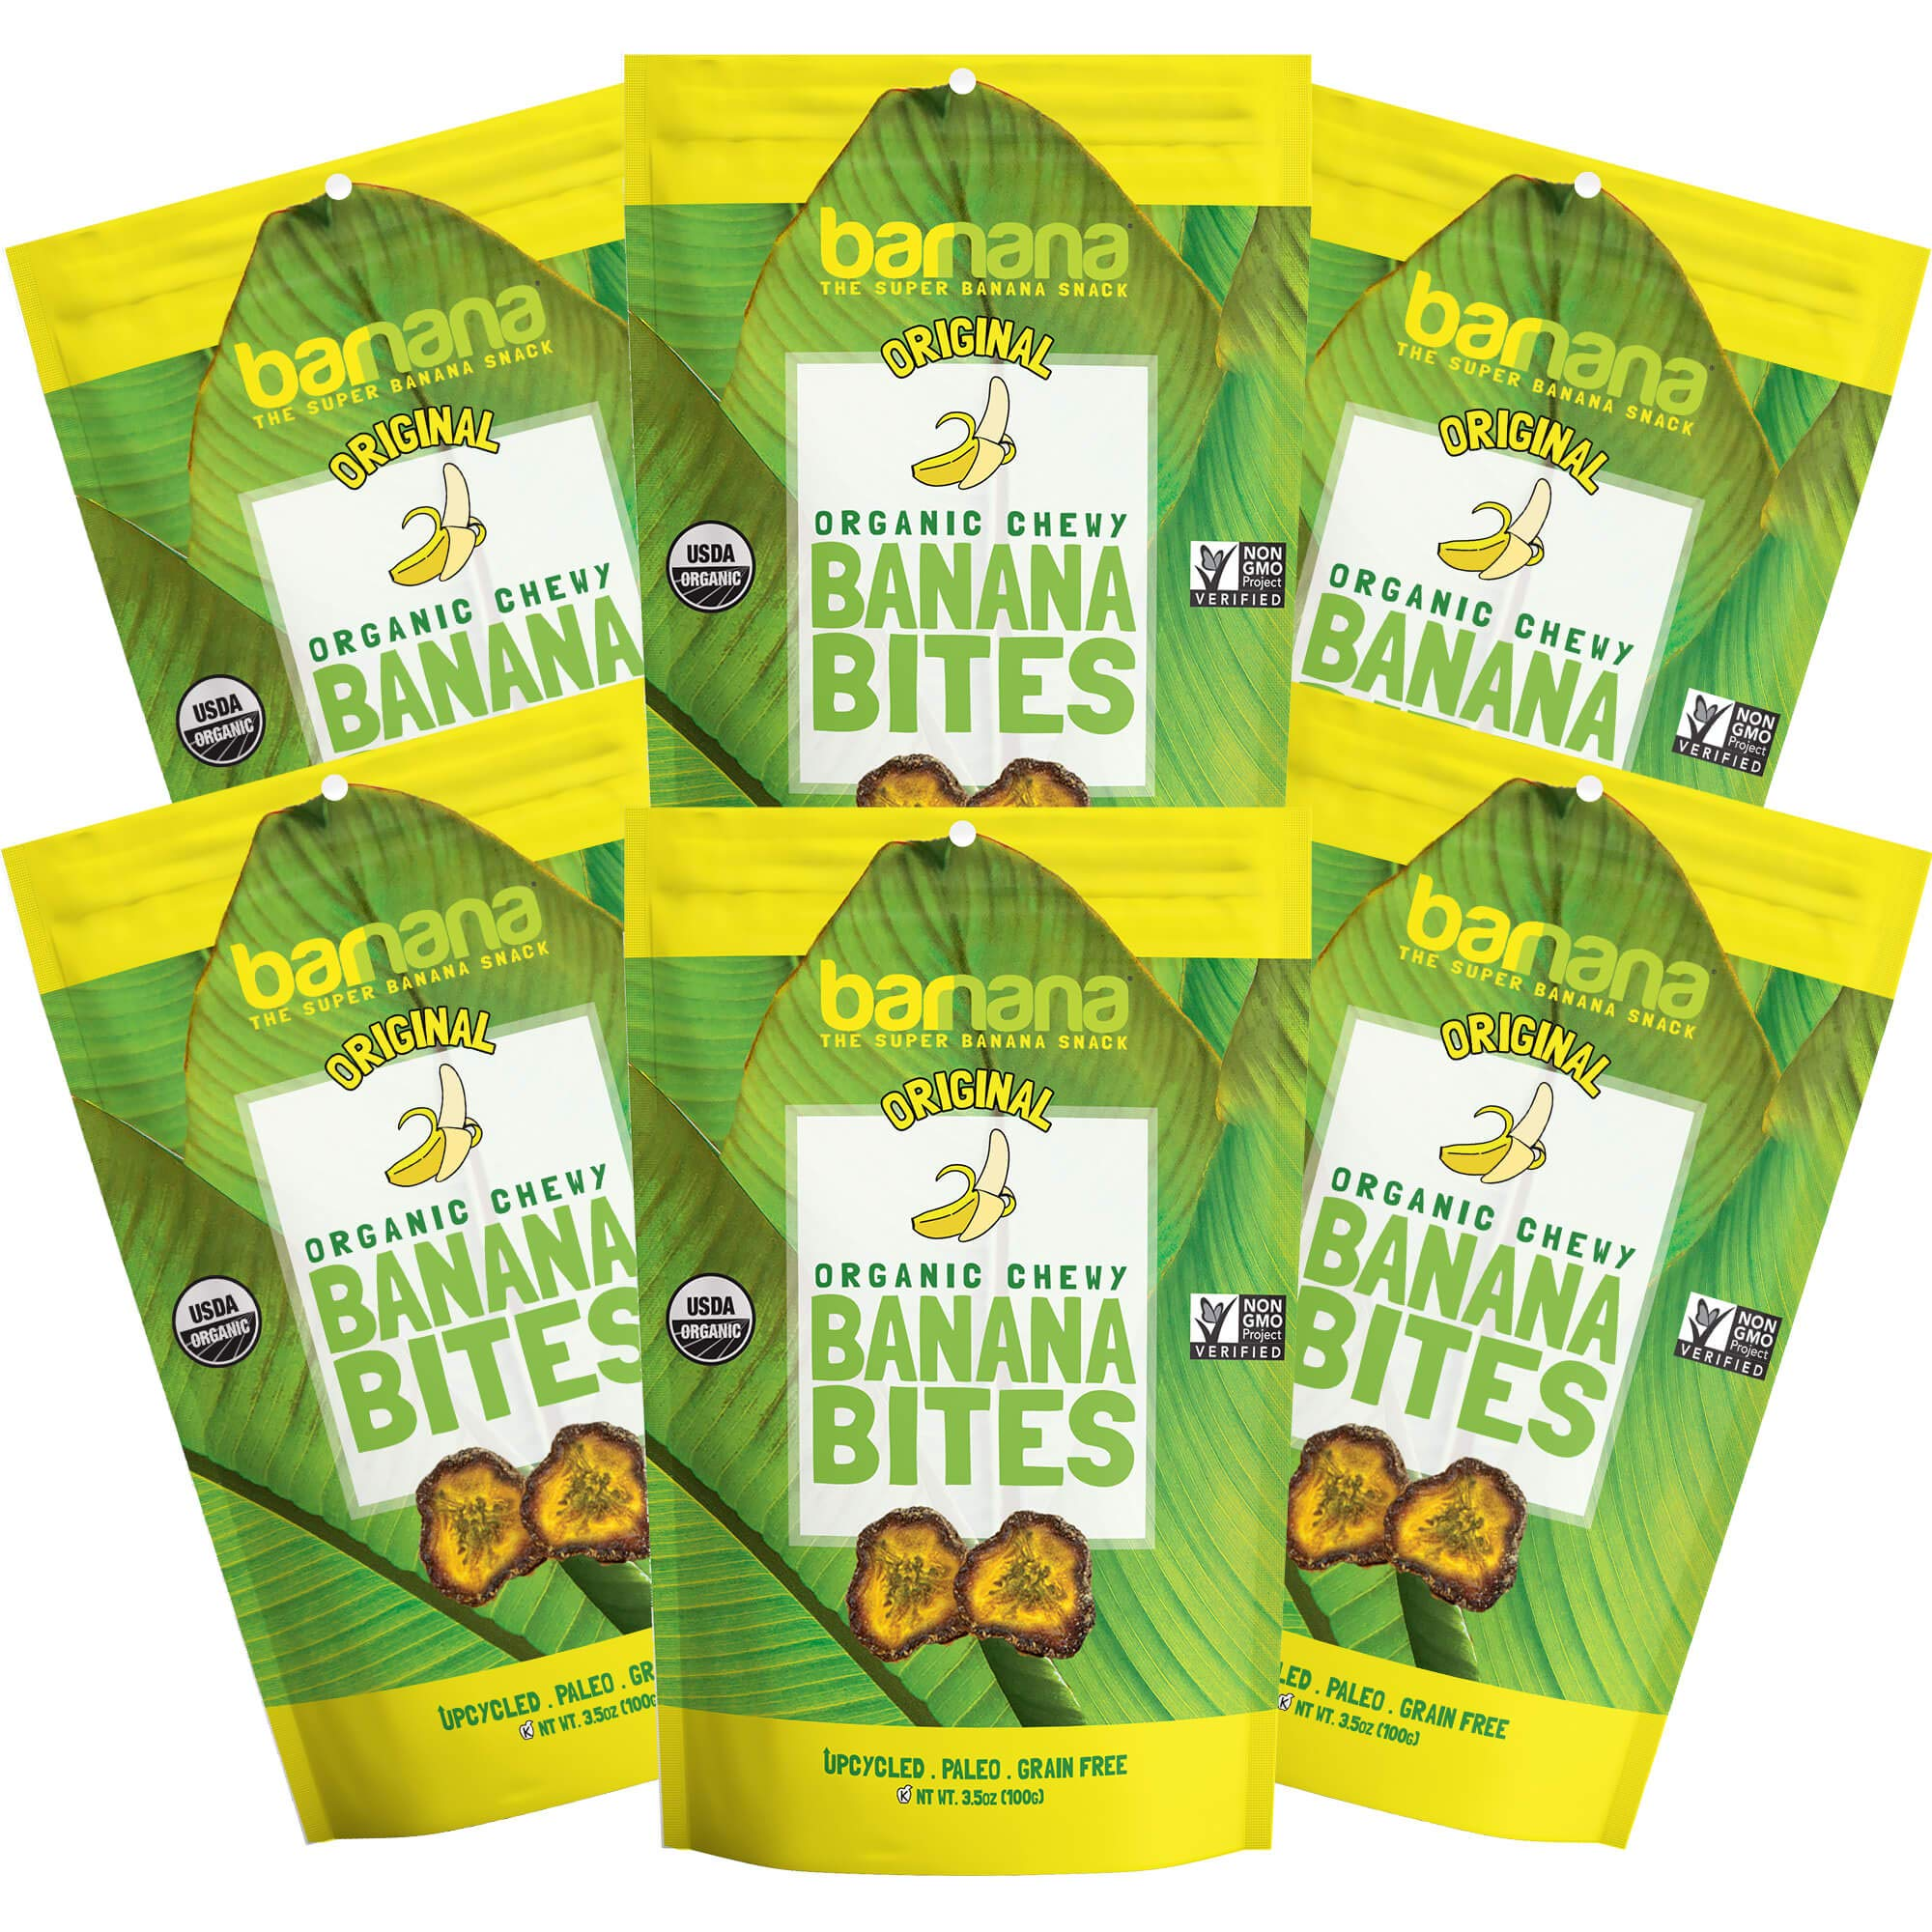 Organic Original Chewy Banana Bites, Delicious Barnana Coated Potassium Rich Banana Snacks, Whole 30, Paleo, Vegetarian, 3.5 Oz, Pack Of 6 by Barnana